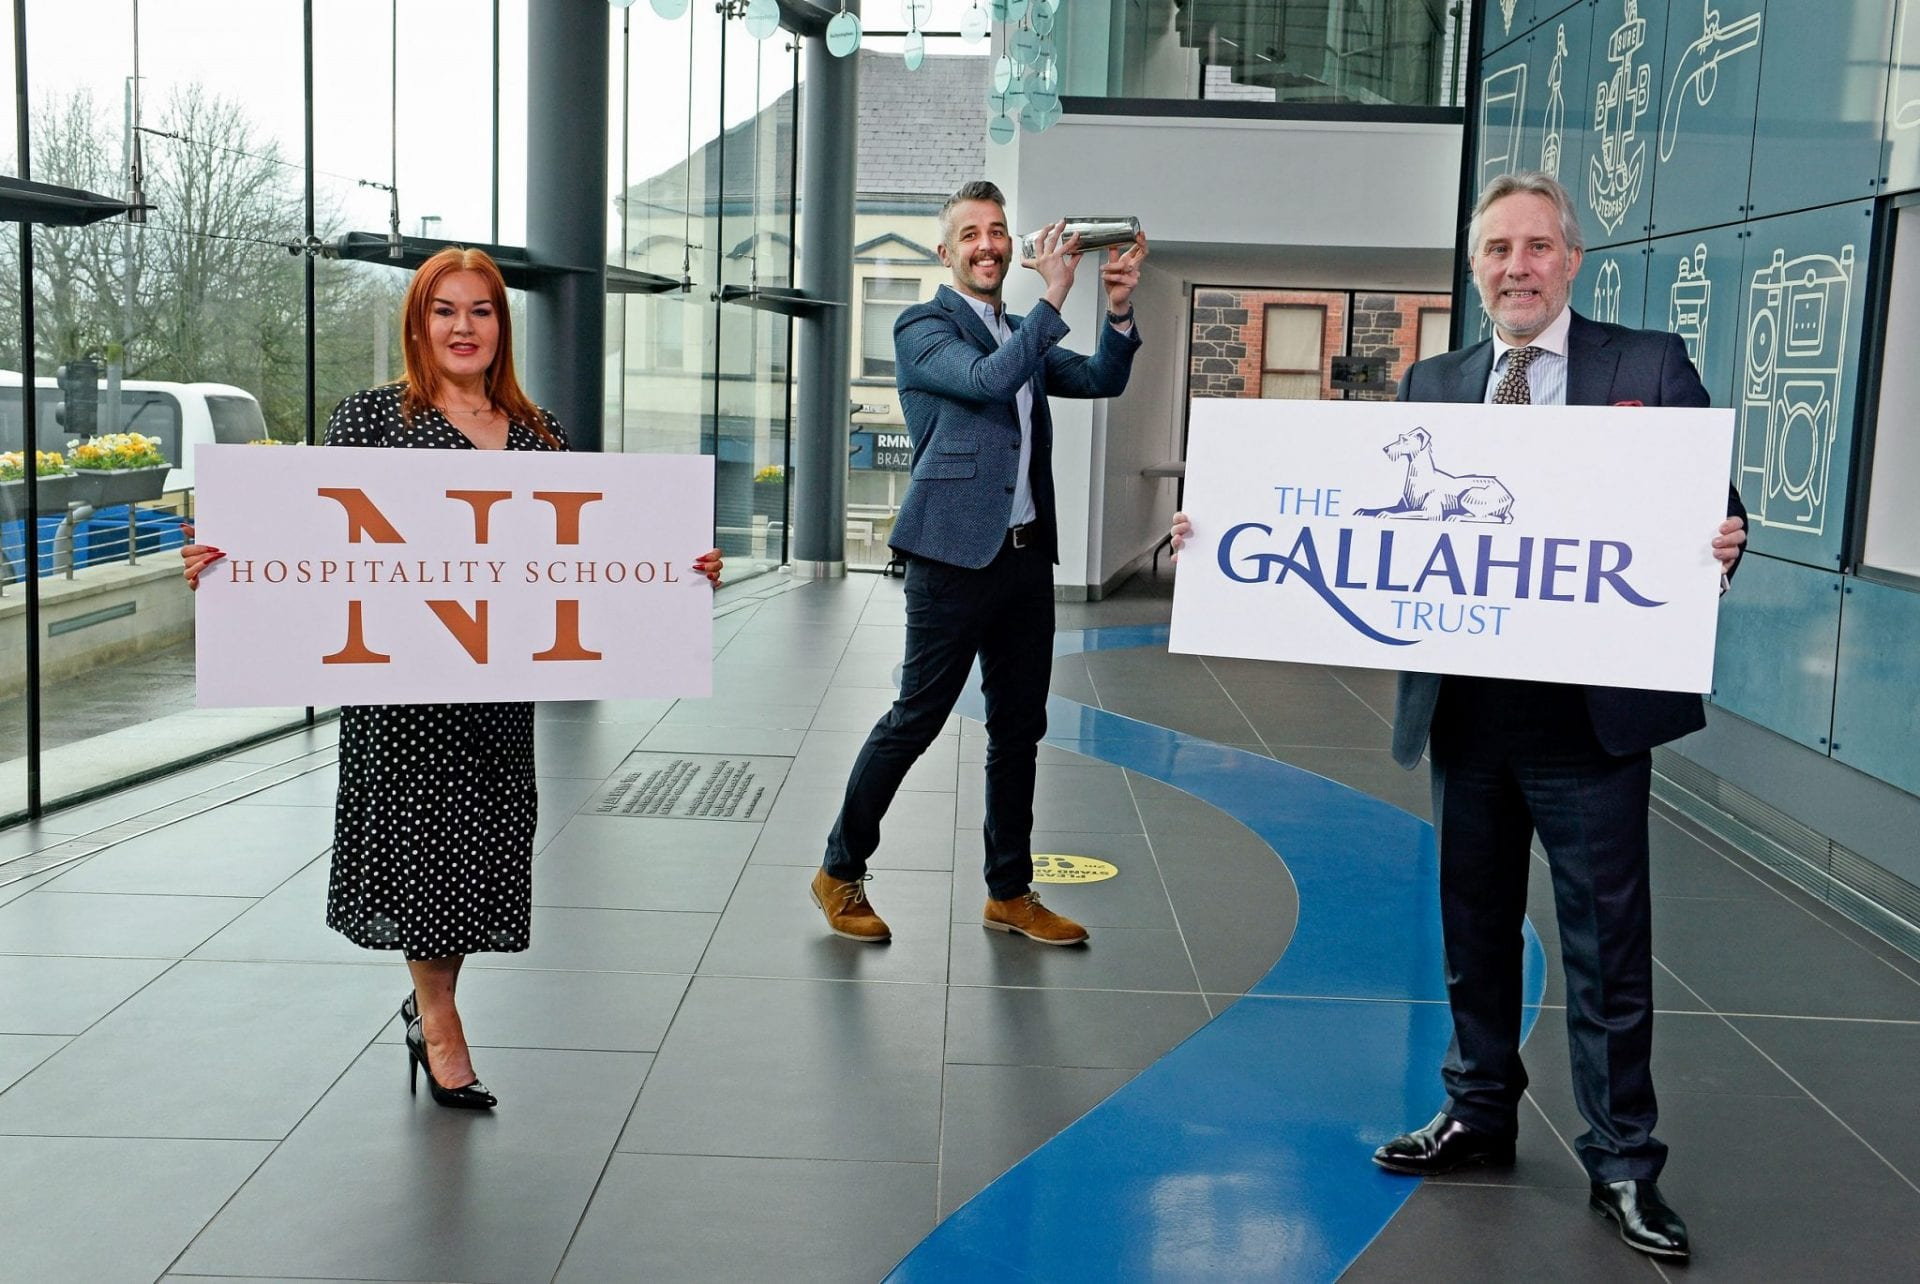 Northern Ireland Hospitality School